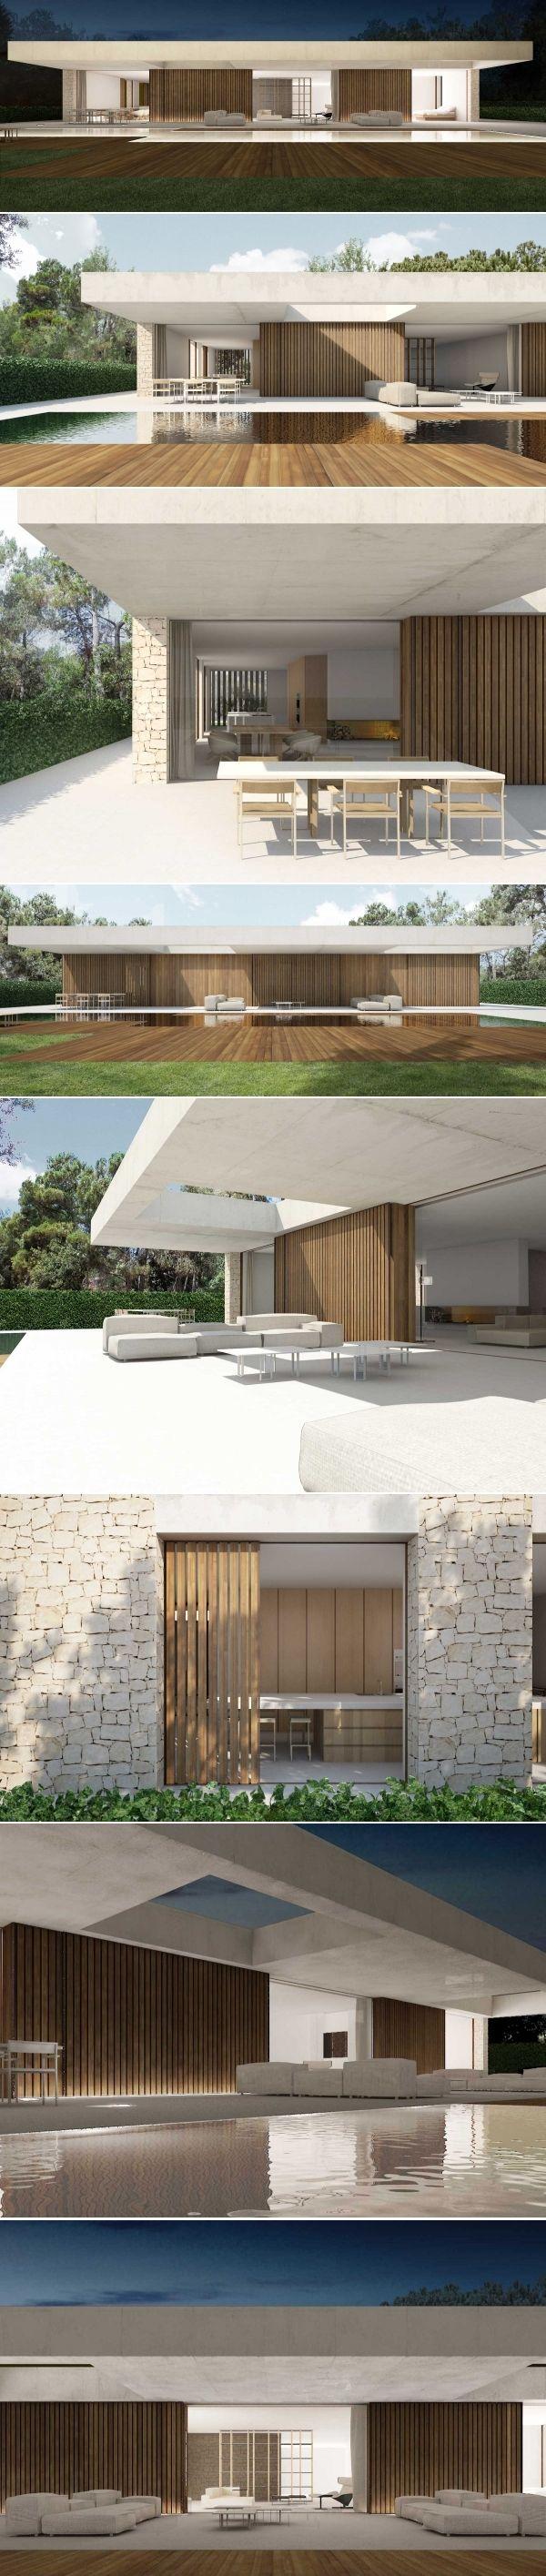 House in La Cañada Spain by Ramon Esteve